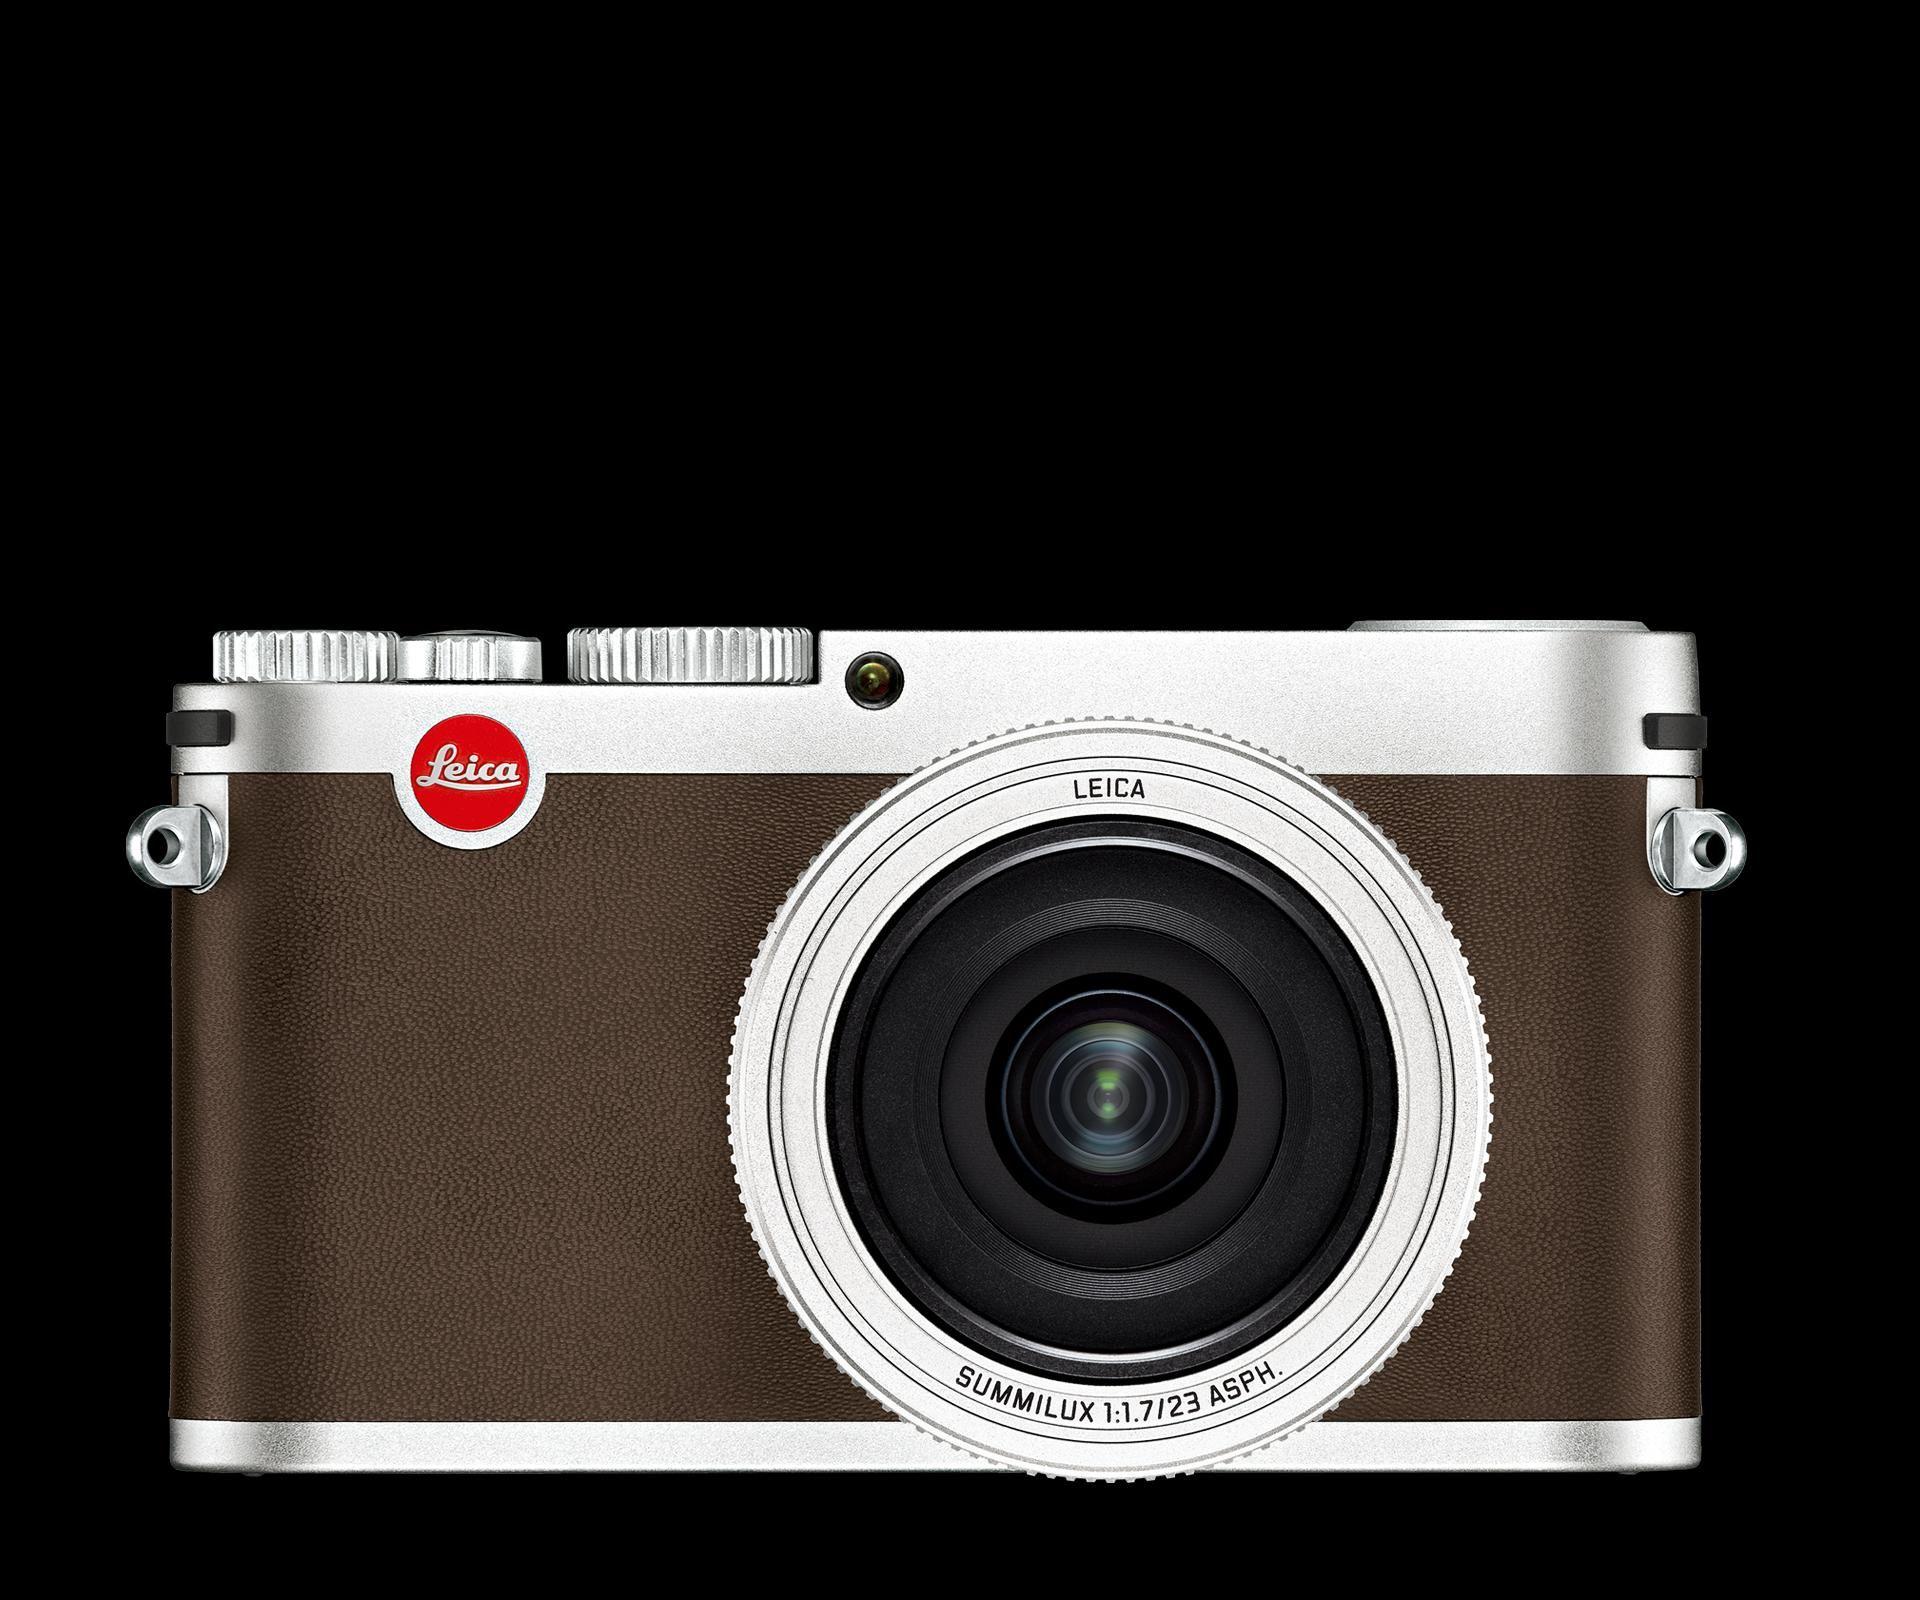 Leica X Typ 113